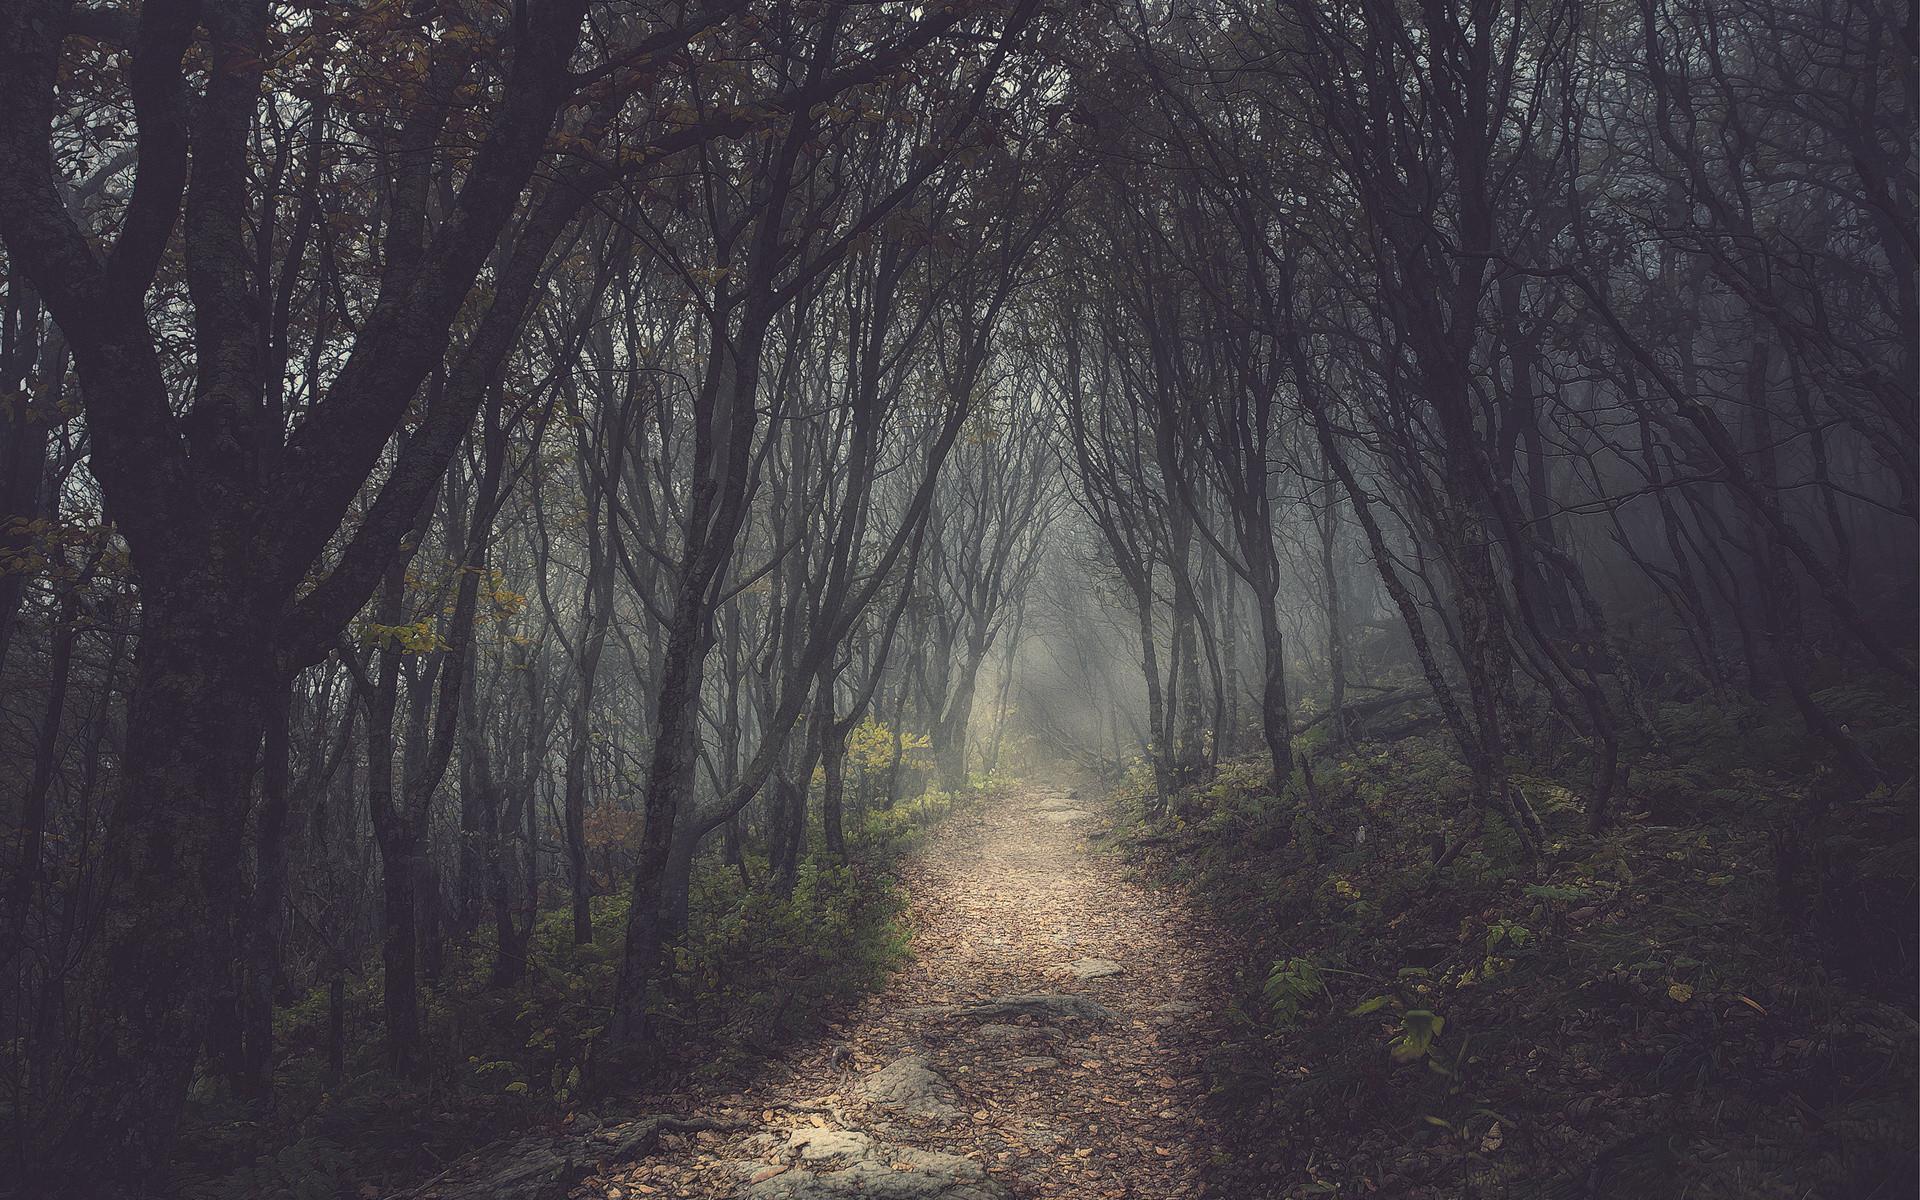 Trees forest path dark wallpaper | | 75113 | WallpaperUP